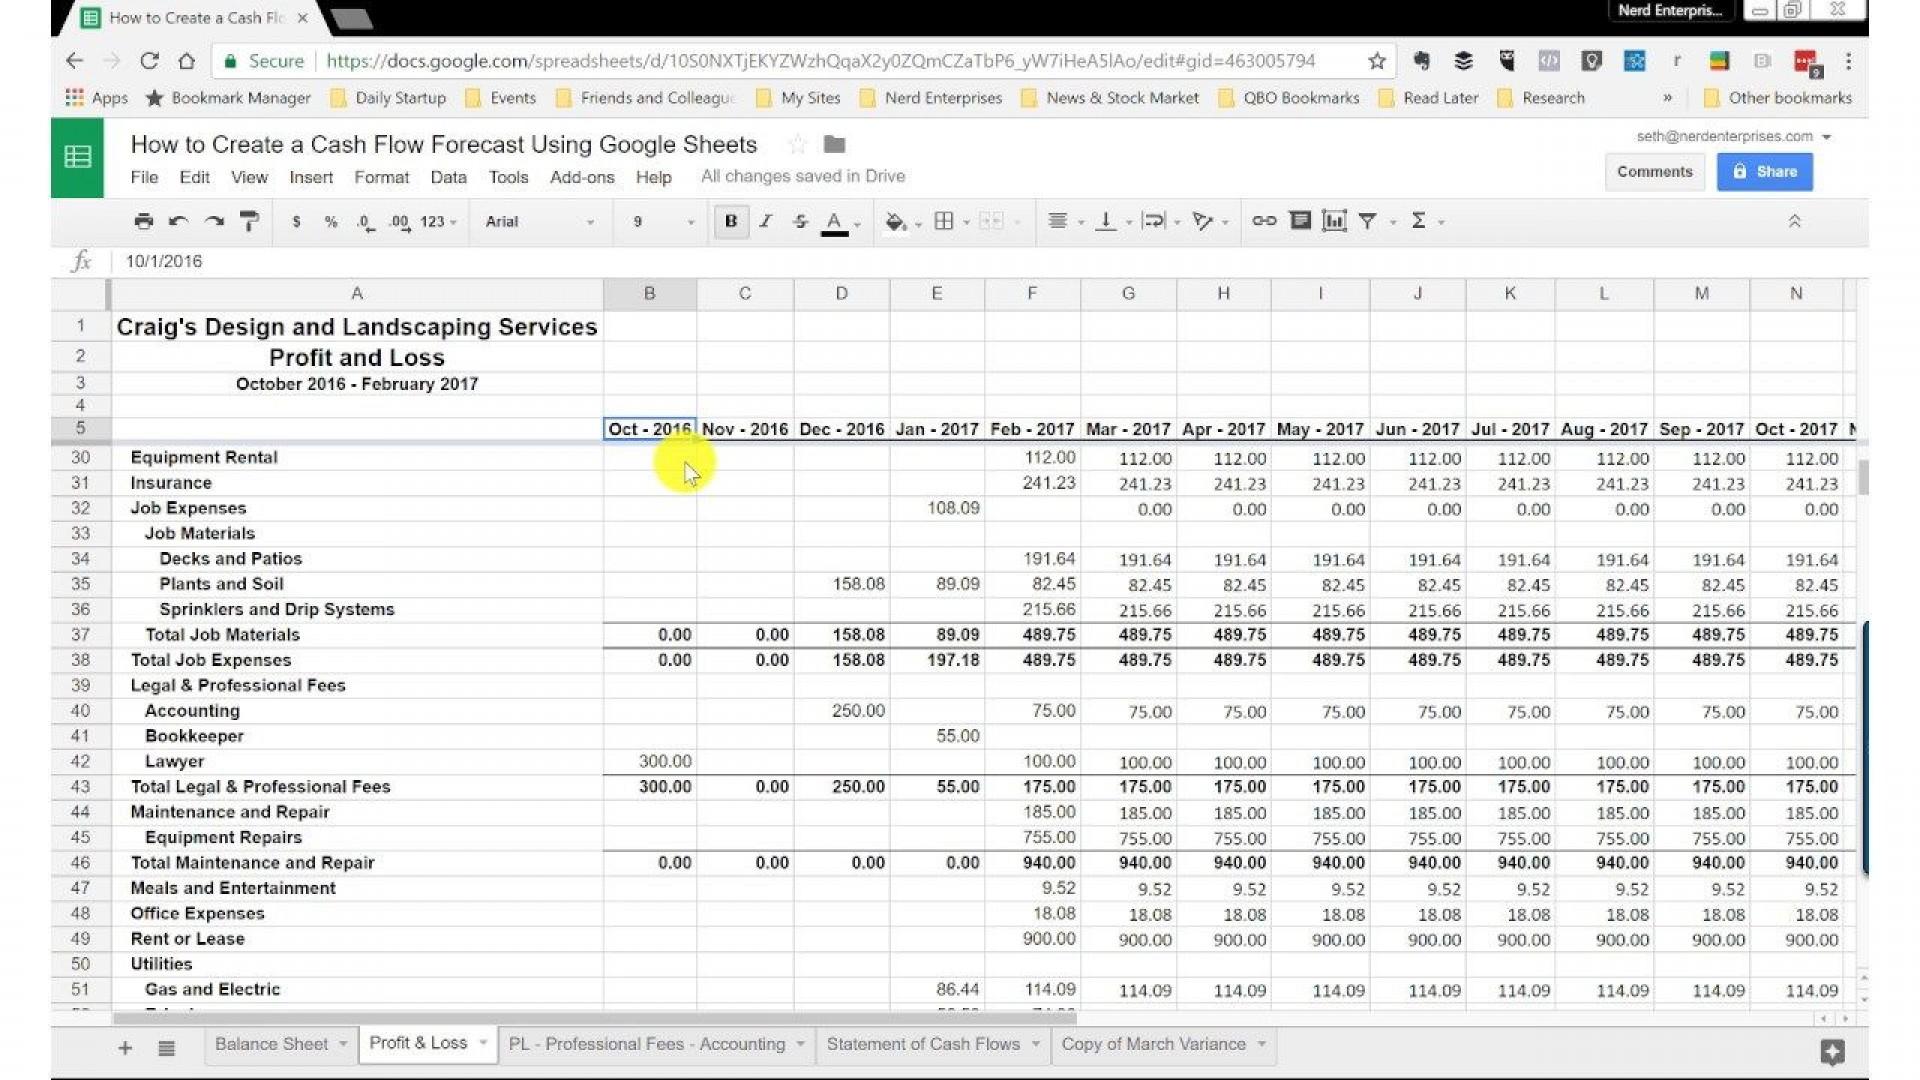 002 Fantastic Statement Of Cash Flow Template Google Doc Highest Quality  Docs1920